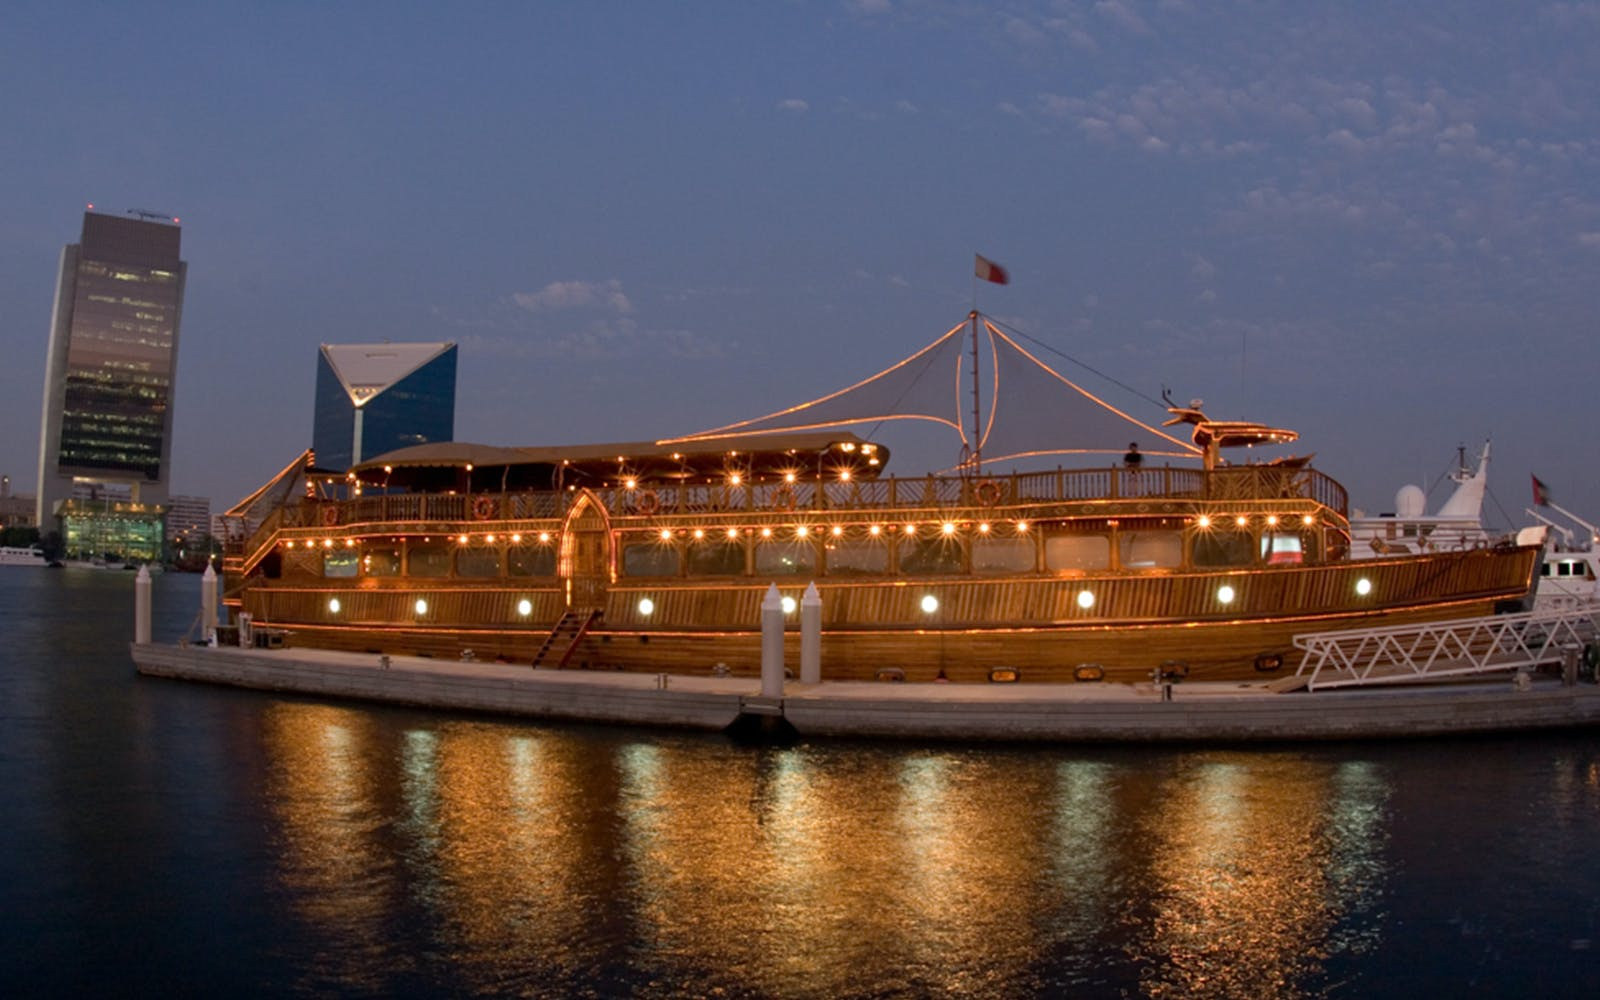 Dubai Dhow Cruise - Dubai Creek Dinner Cruise